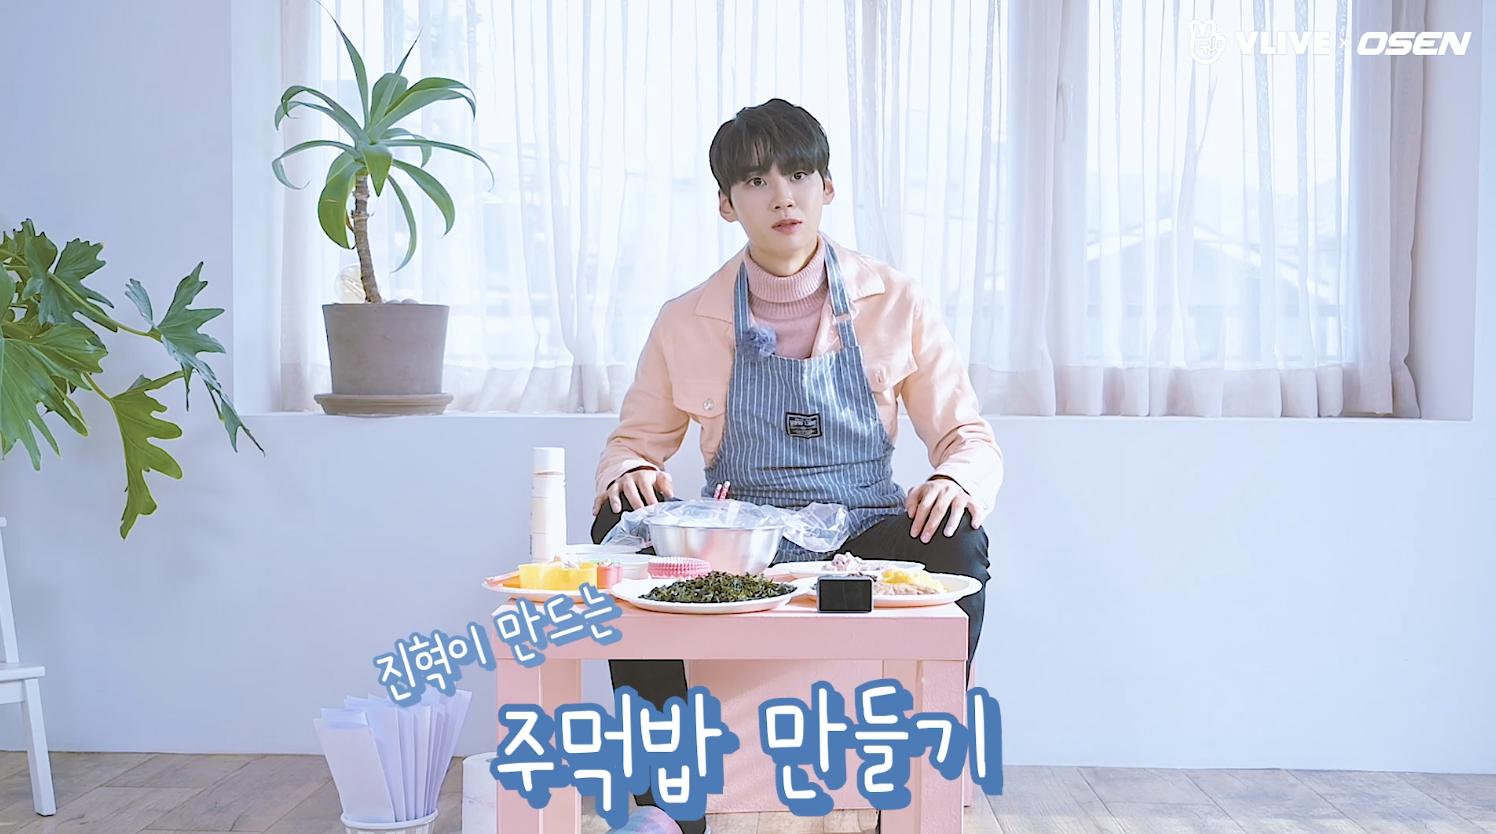 LEE JIN HYUK 이진혁, 주먹밥 만들기 도전 #스타로드 03